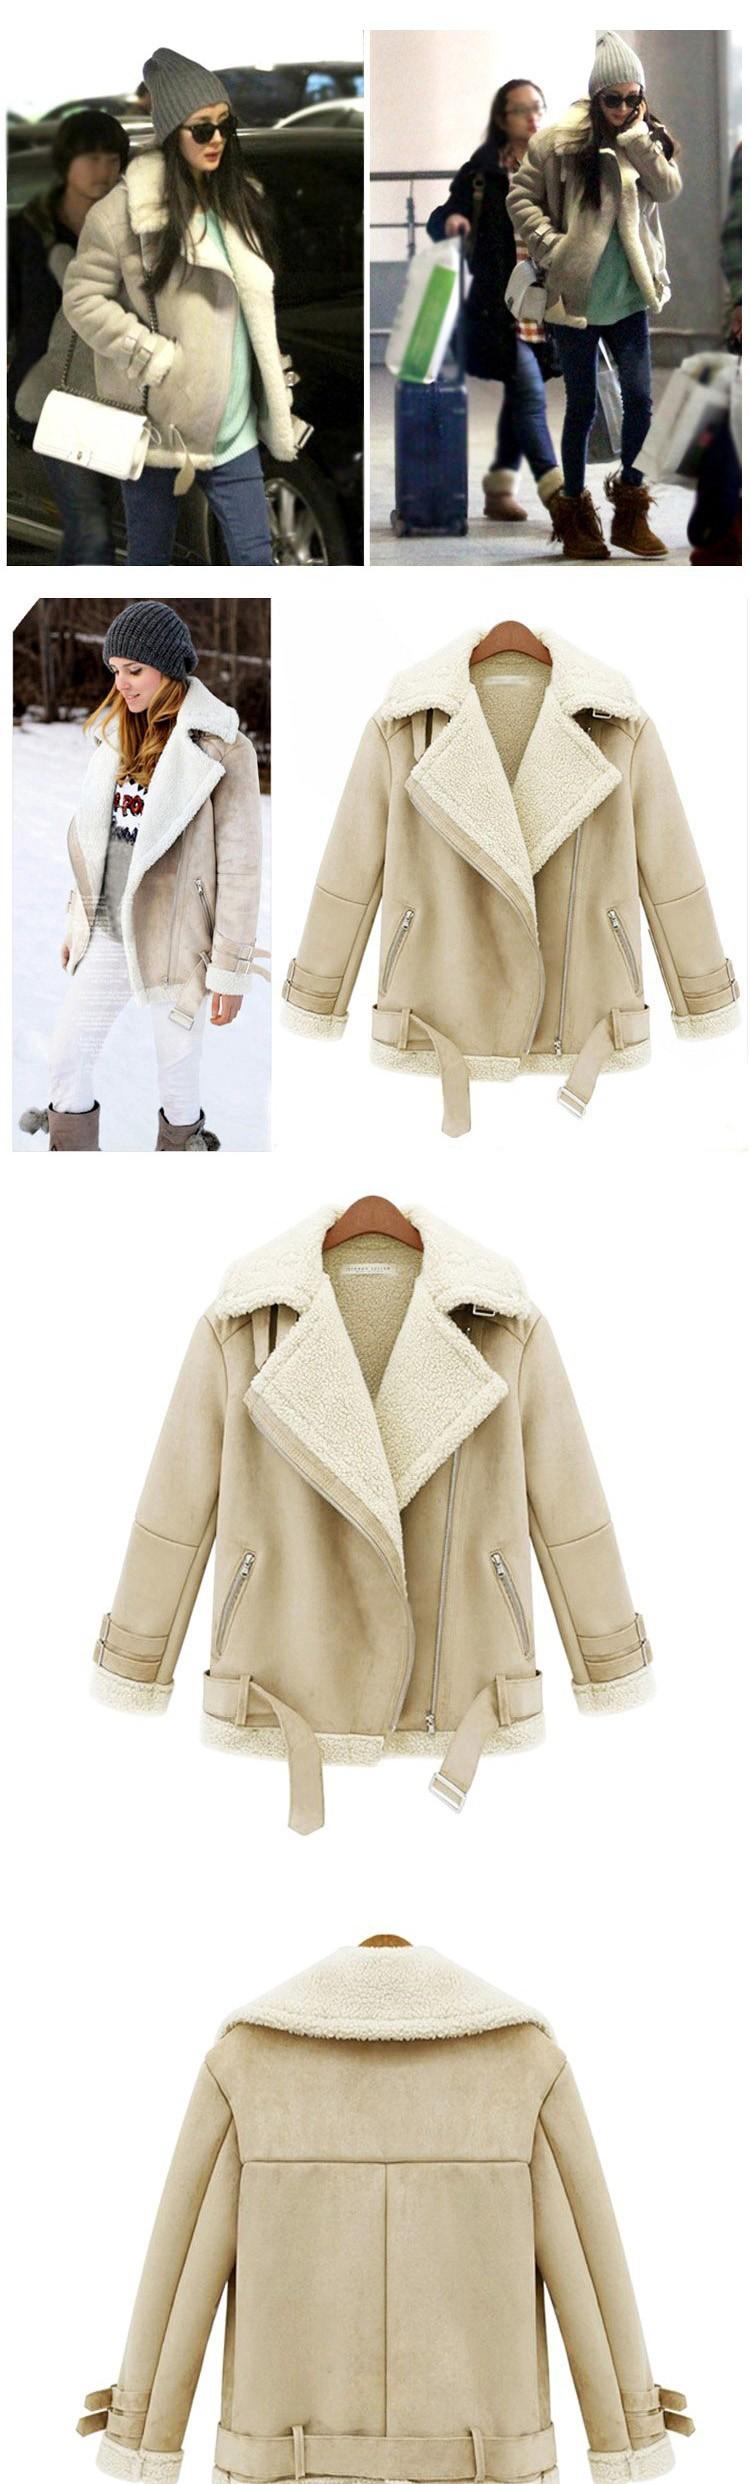 fur coat (5)